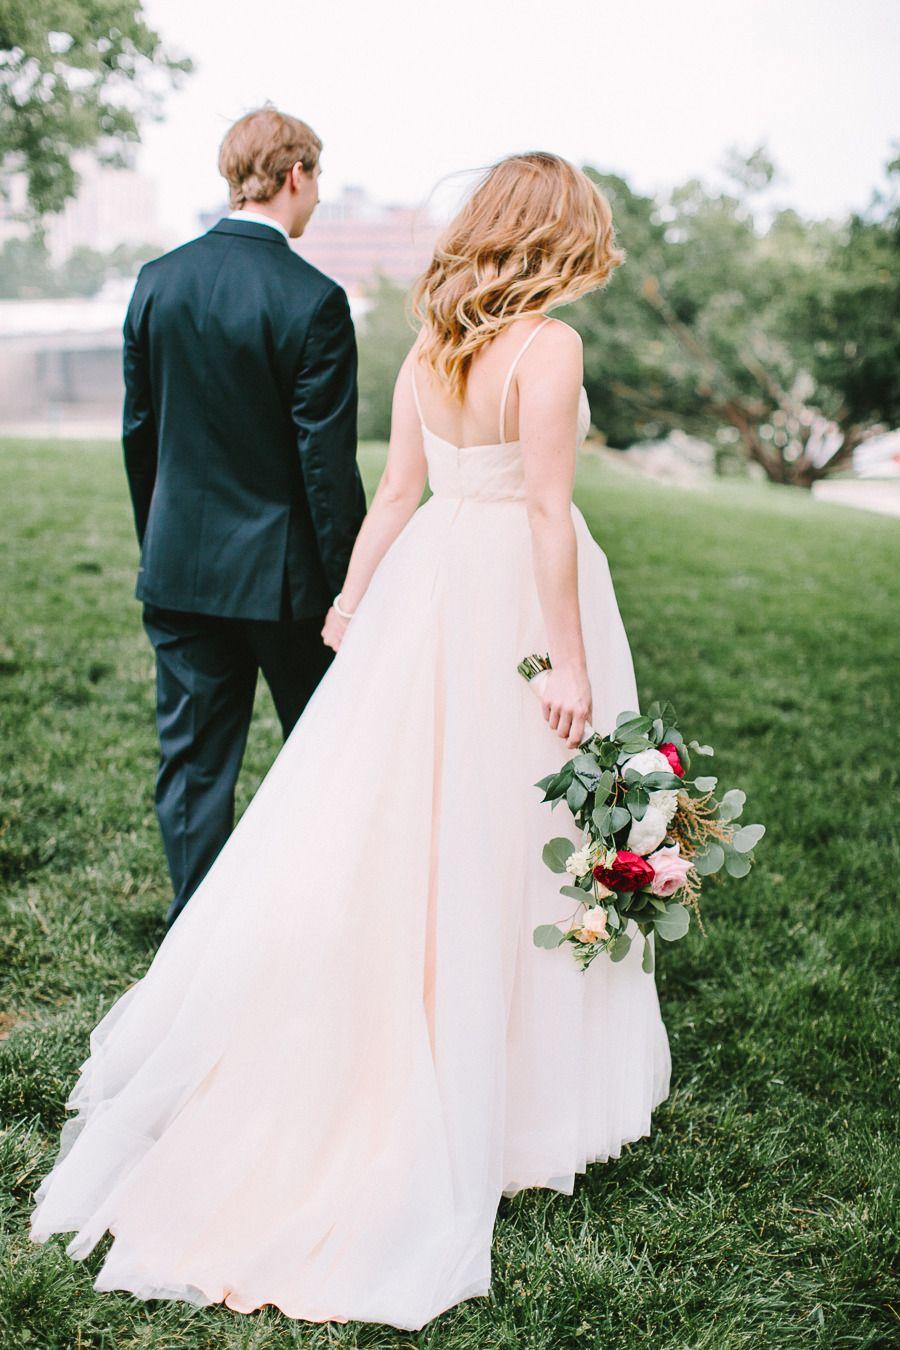 Glamorous Diy Wedding At The Dayton Ohio Art Institute Blush Pink Wedding Dress Pink Wedding Dresses Colored Wedding Dresses